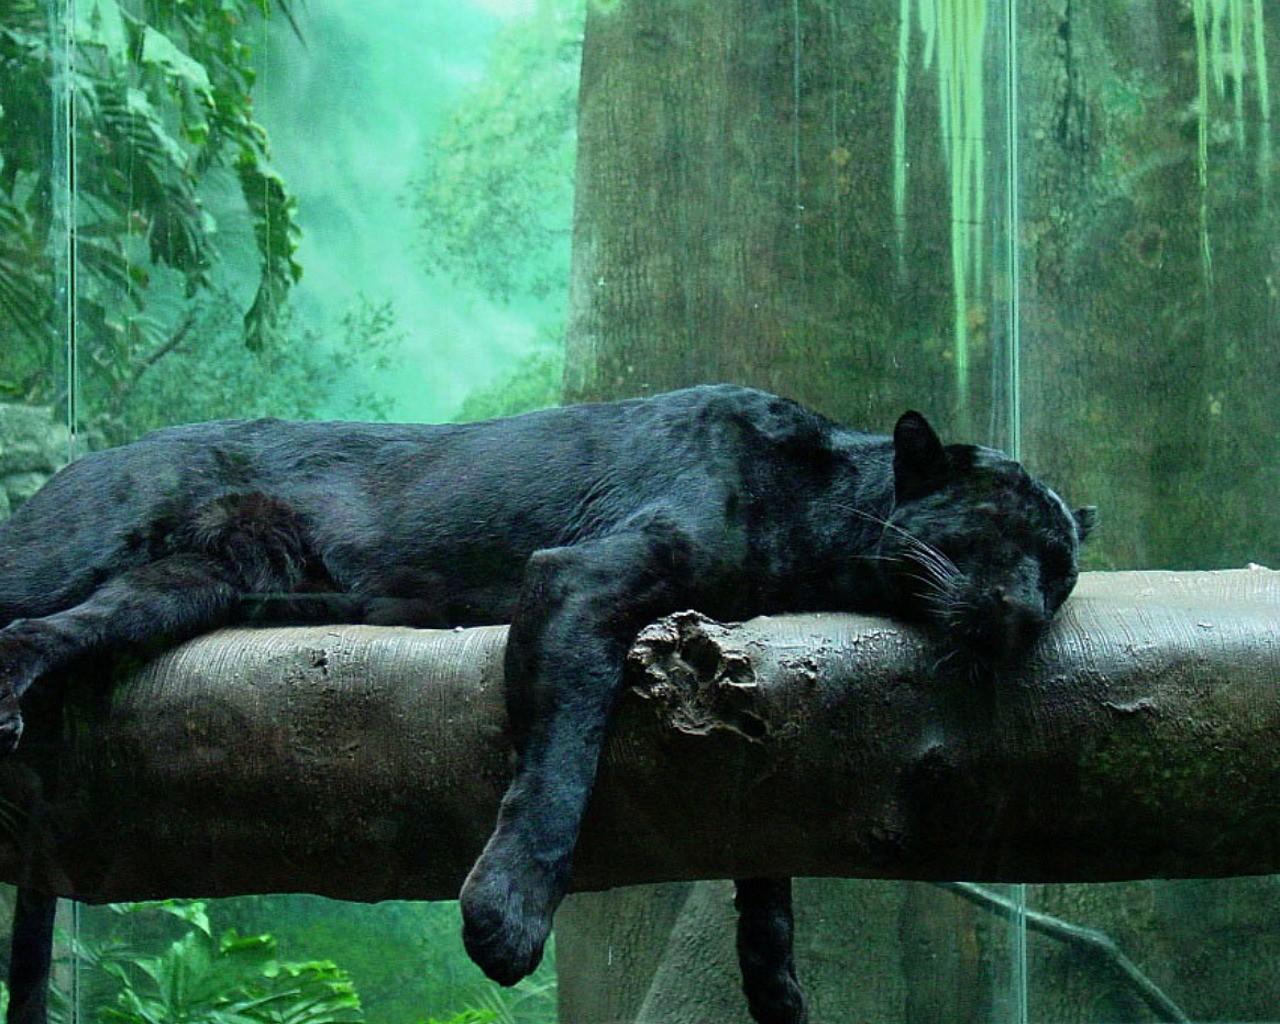 Jungle Animals Panthers Black Panther Fresh Hd Wallpaper 1280x1024